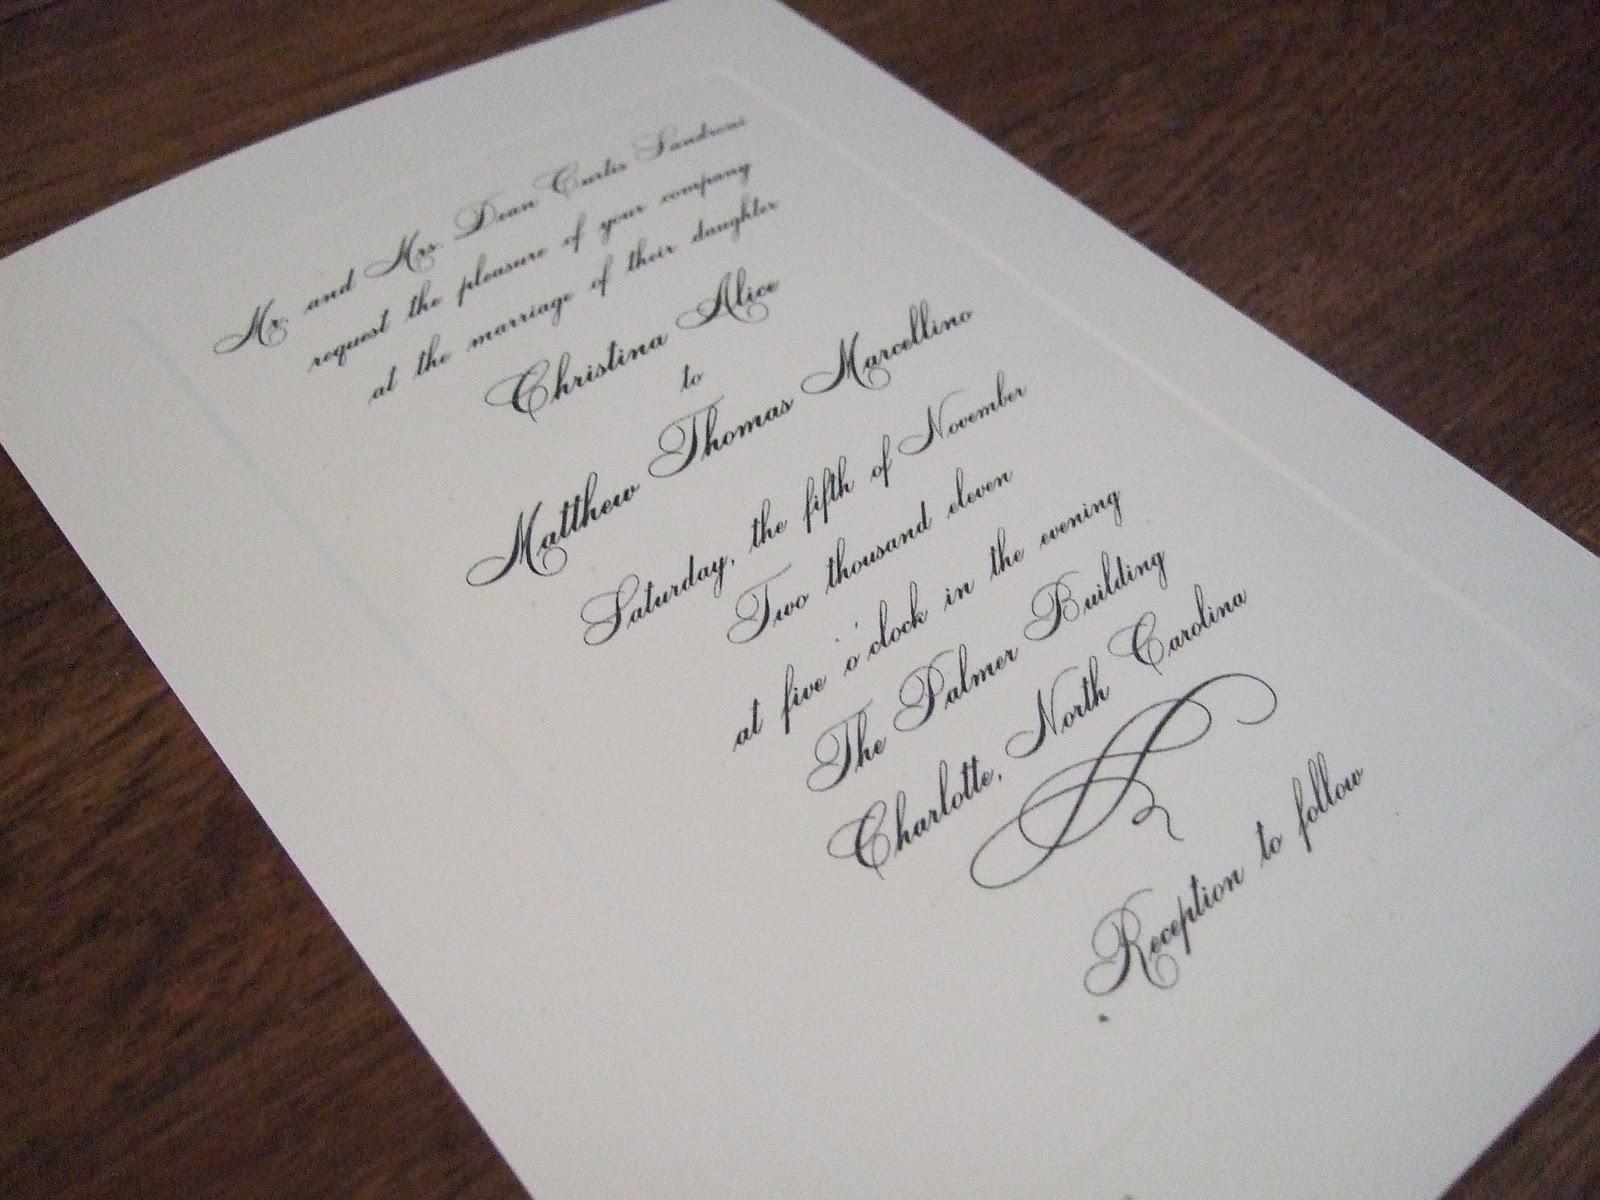 Invitation Note For Wedding: Wedding Invitations